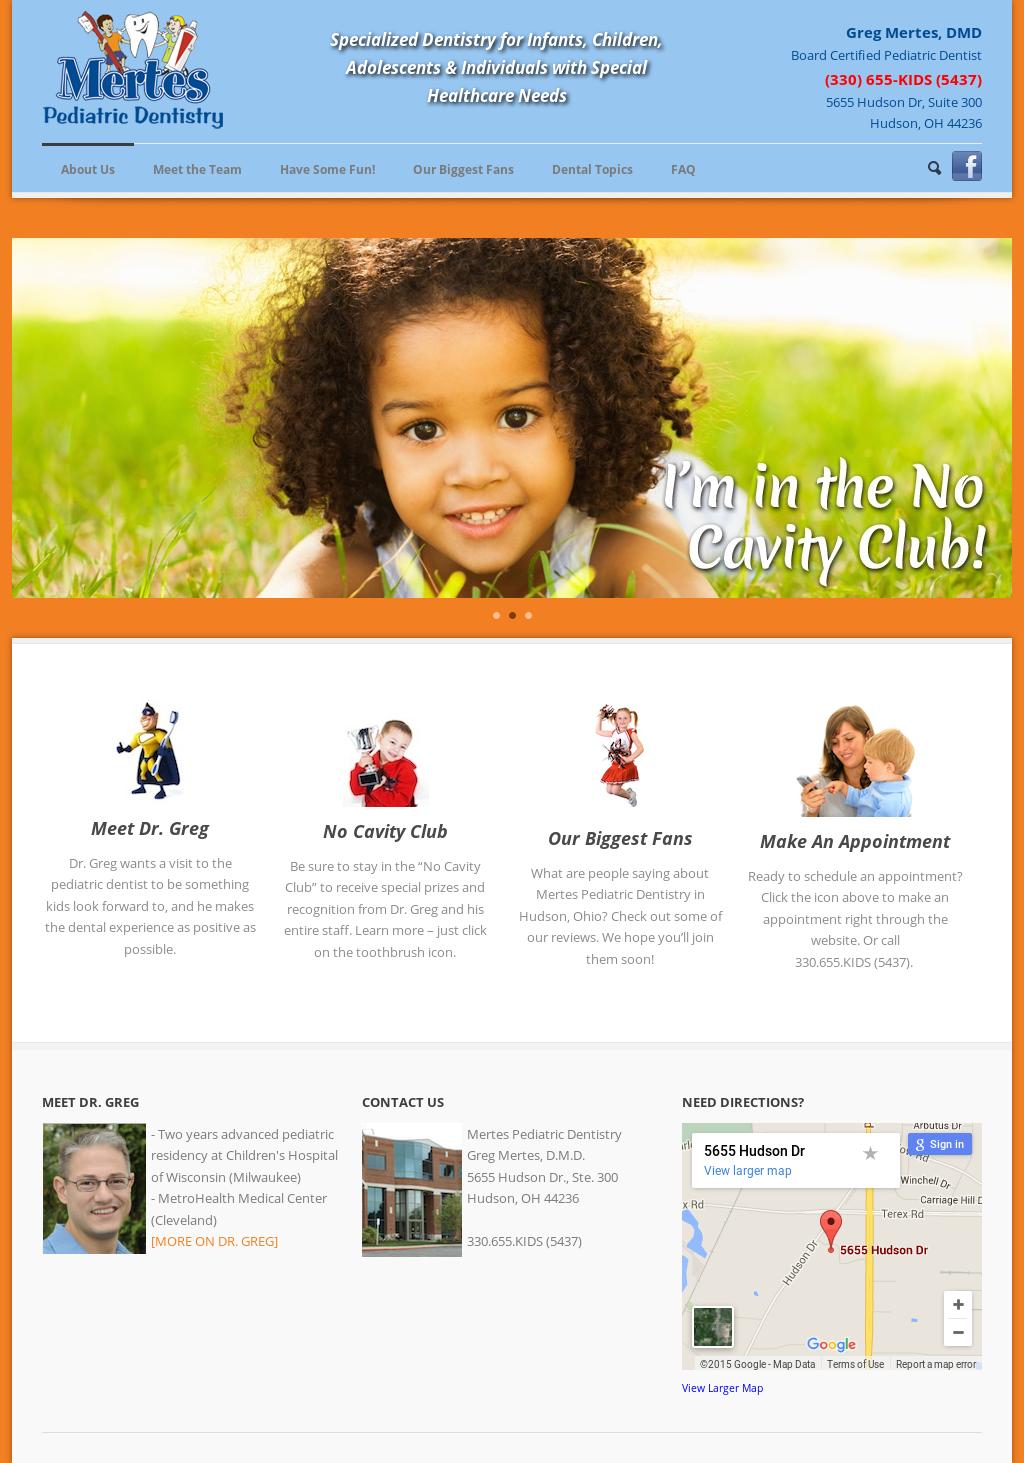 Mertes Pediatric Dentistry Competitors, Revenue and